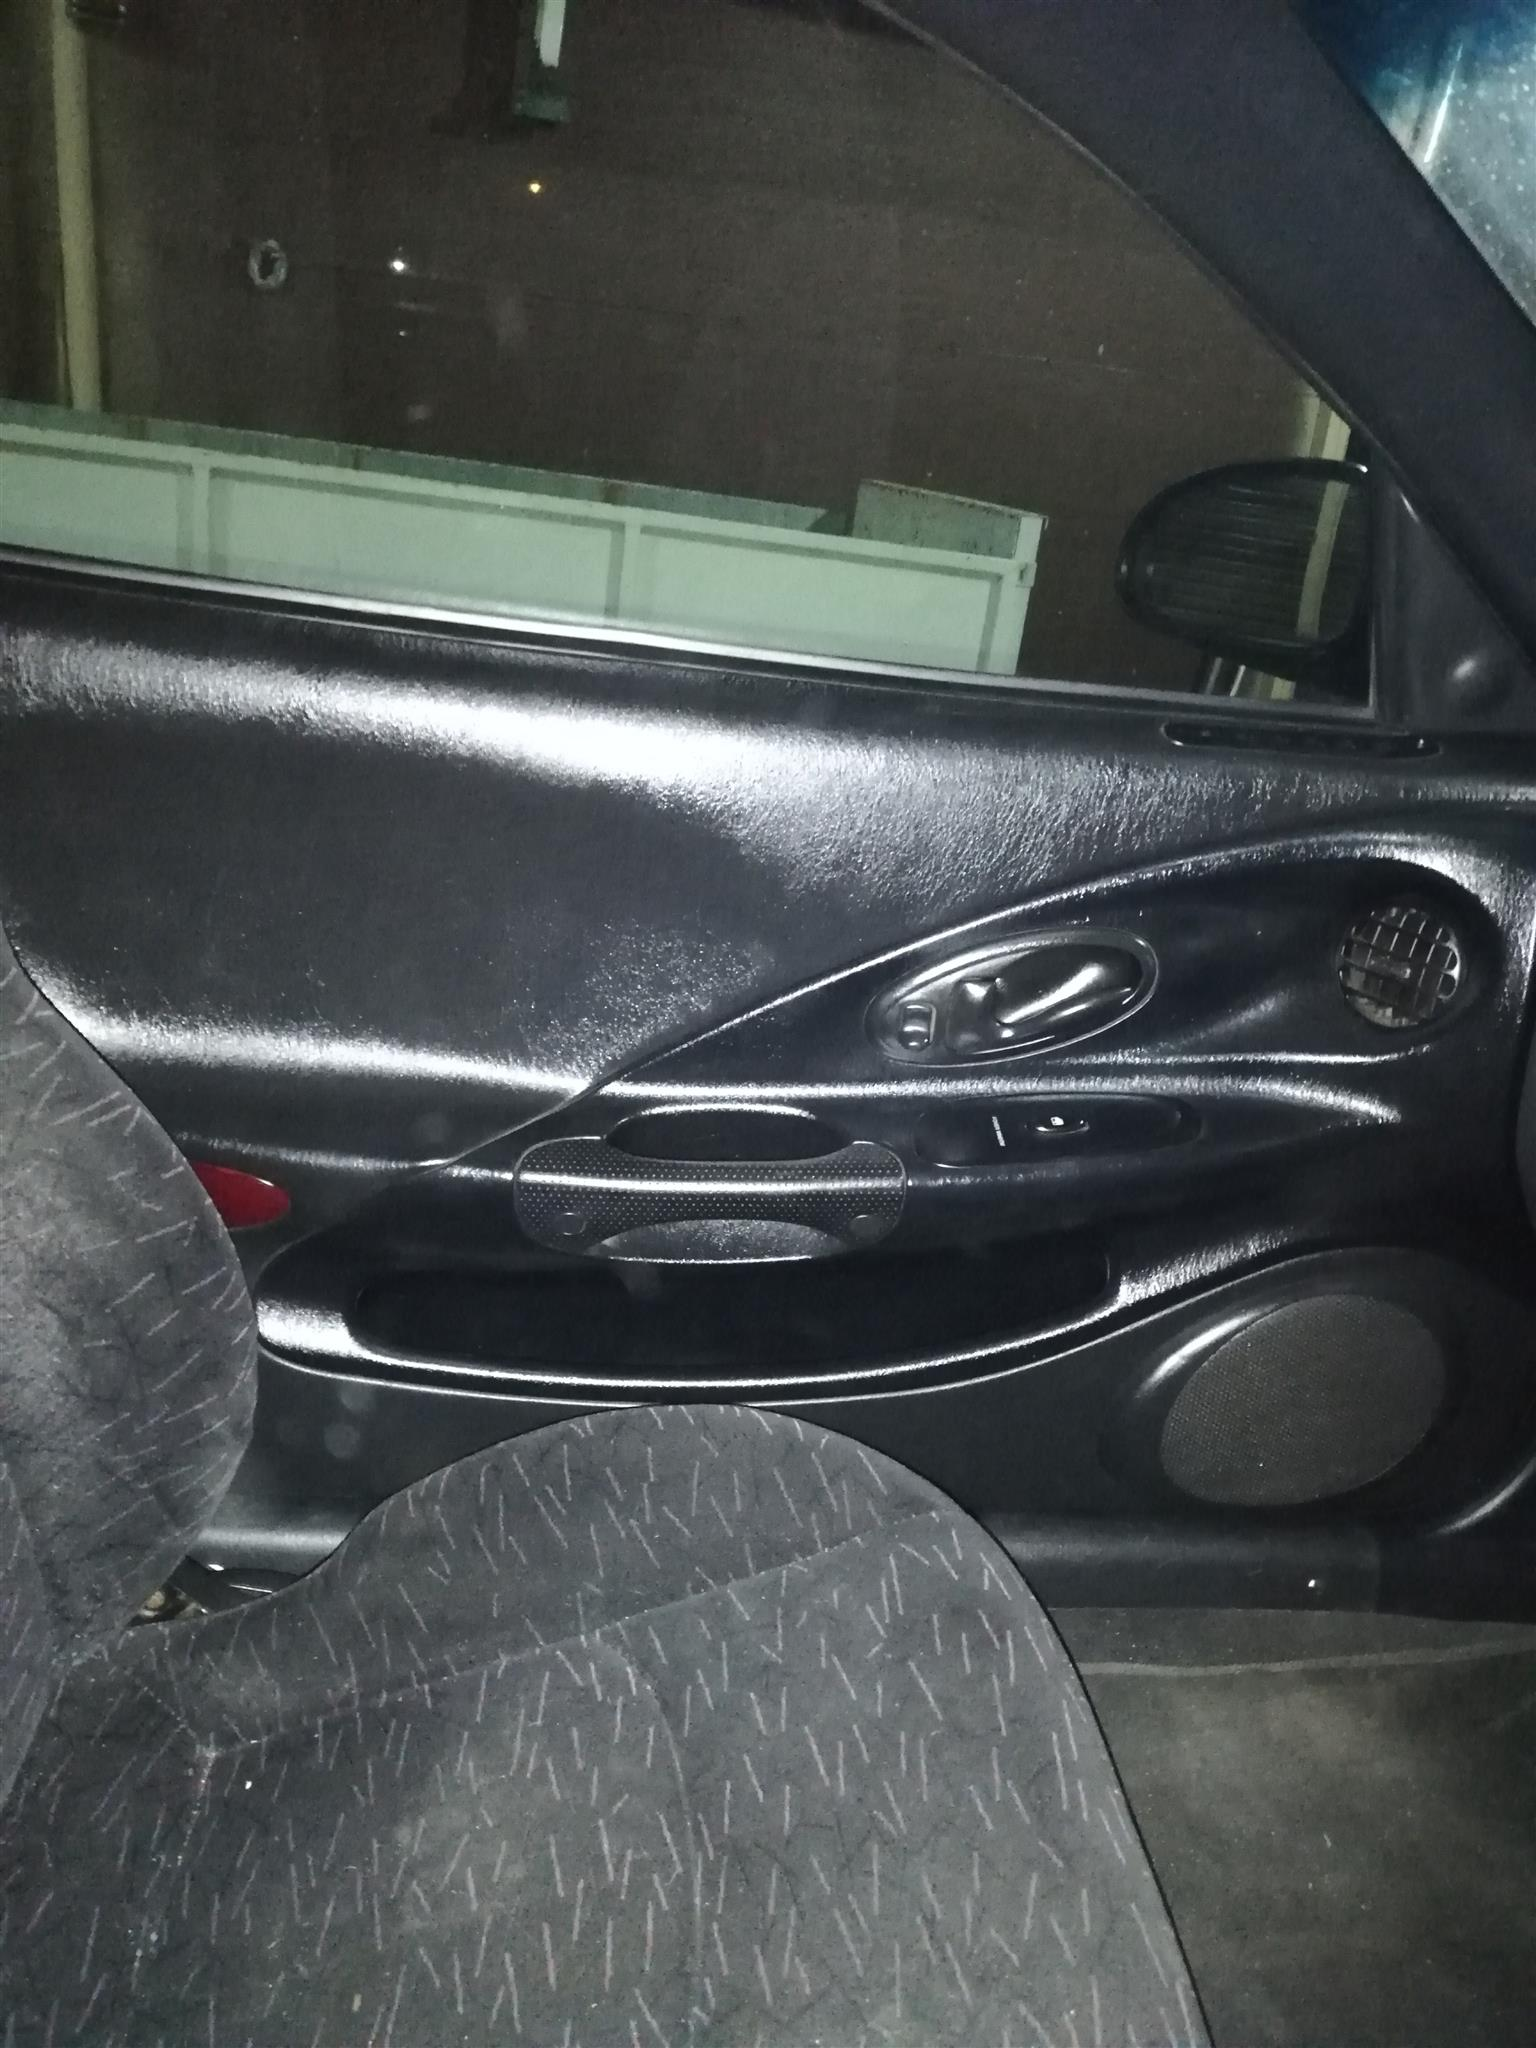 1997 Hyundai Tiburon 2.0 GLS